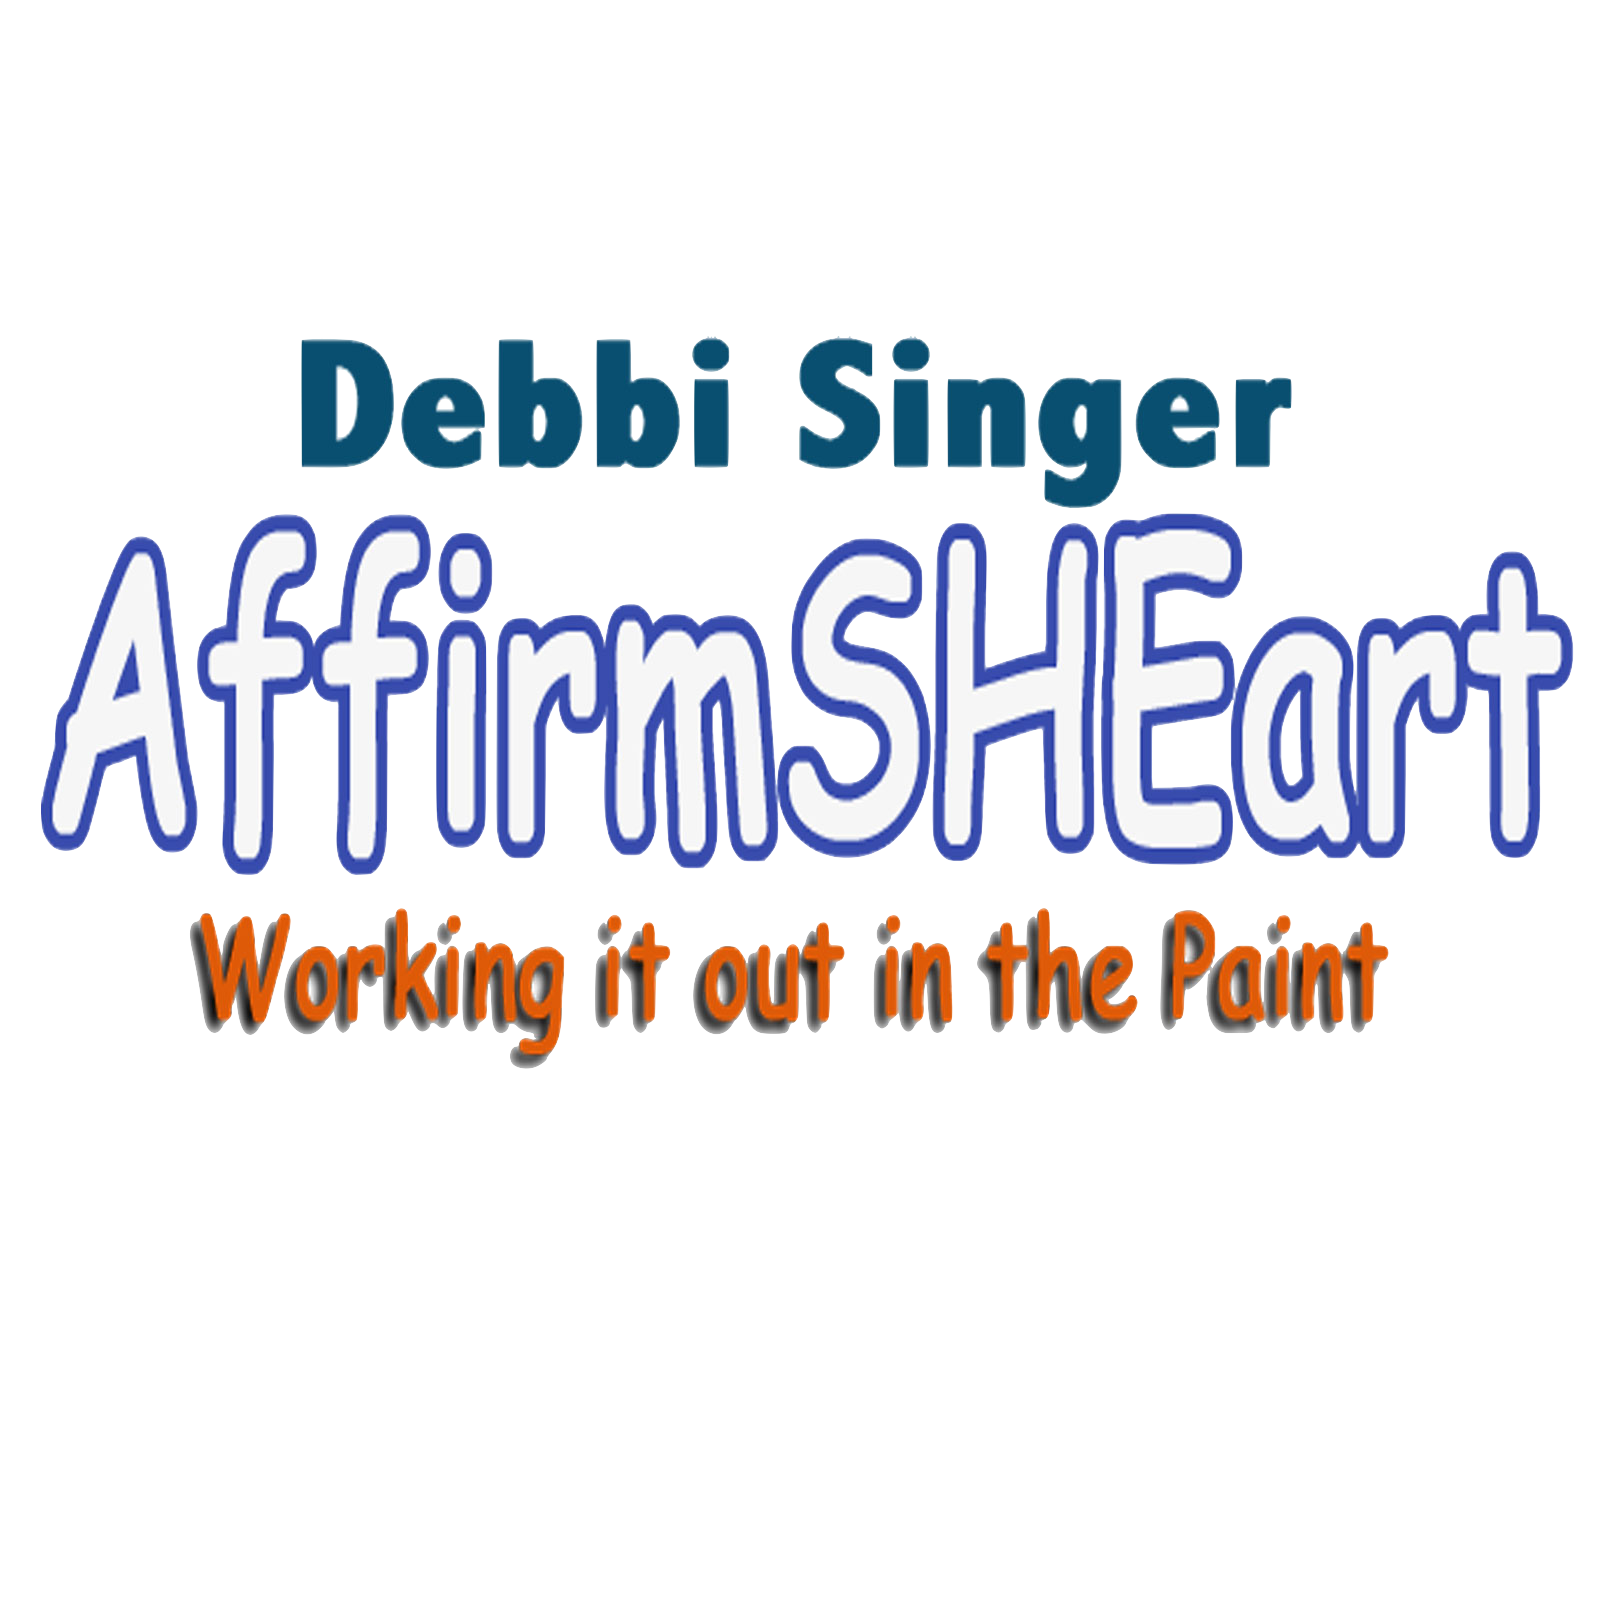 AffirmSHEart